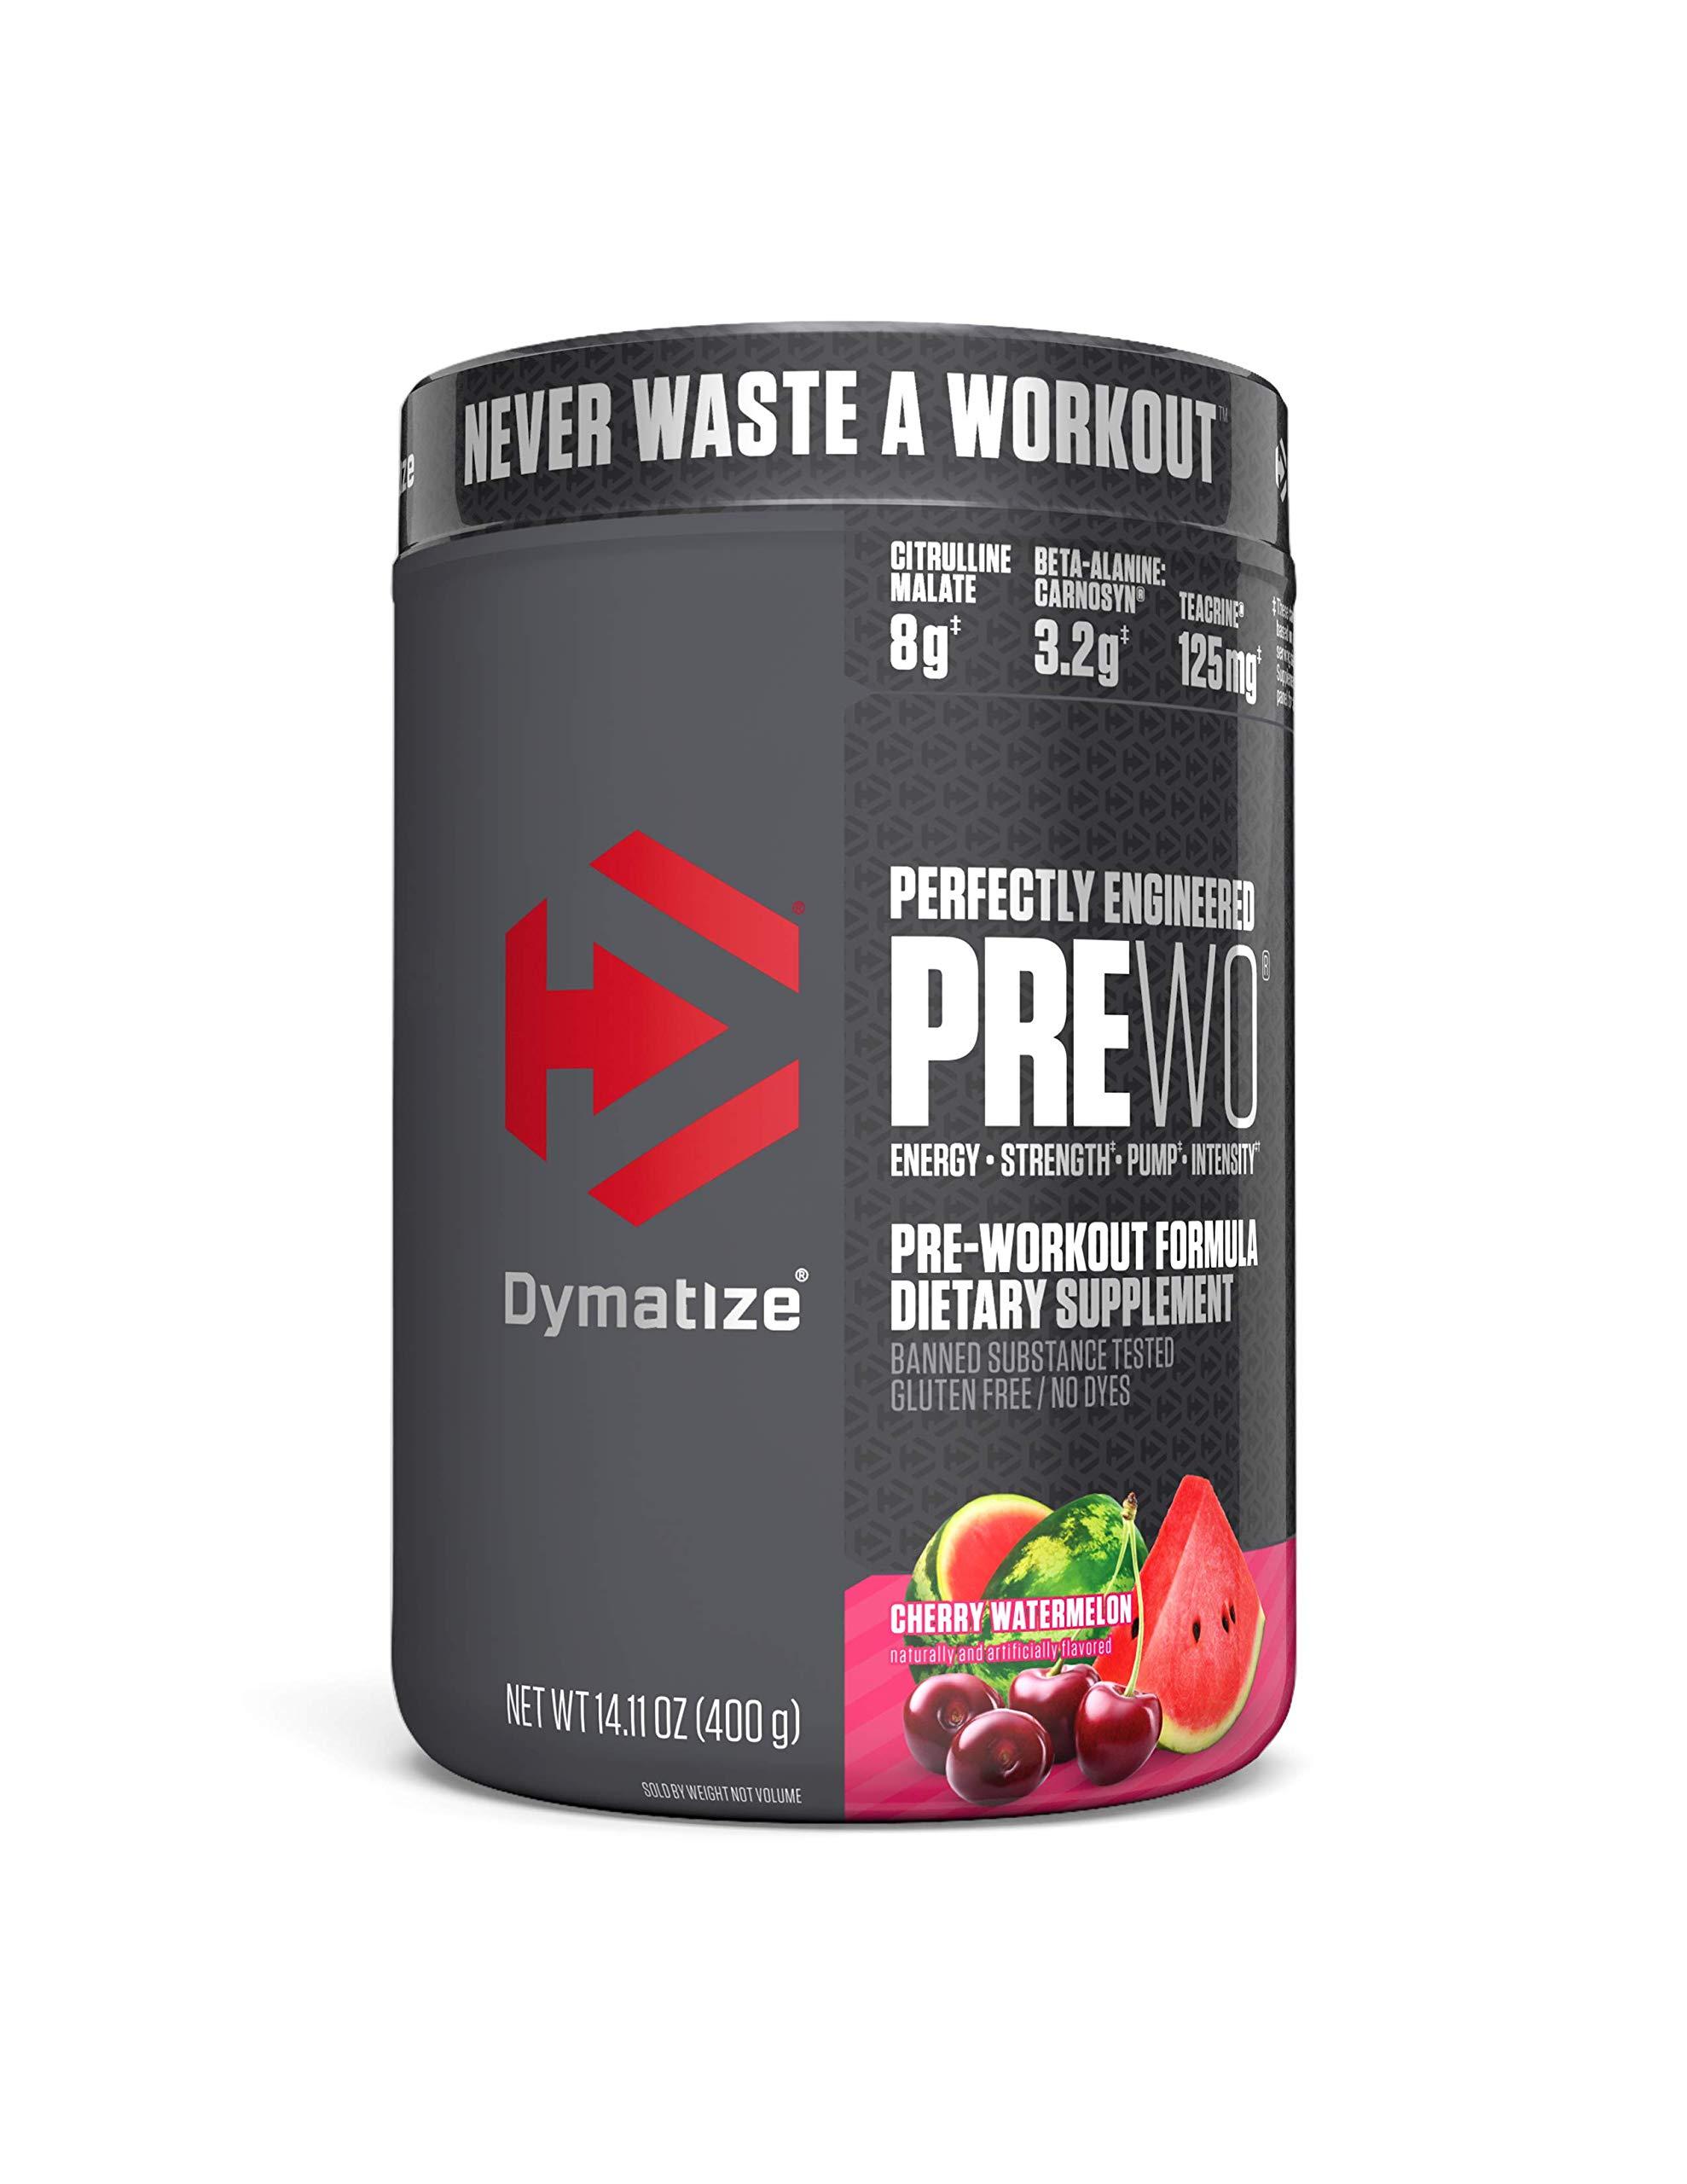 Dymatize PreW.O., Pre Workout Powder with Caffeine, Maximize Energy, Strength & Endurance, Amplify Intensity of Workouts, Cherry Watermelon, 400g